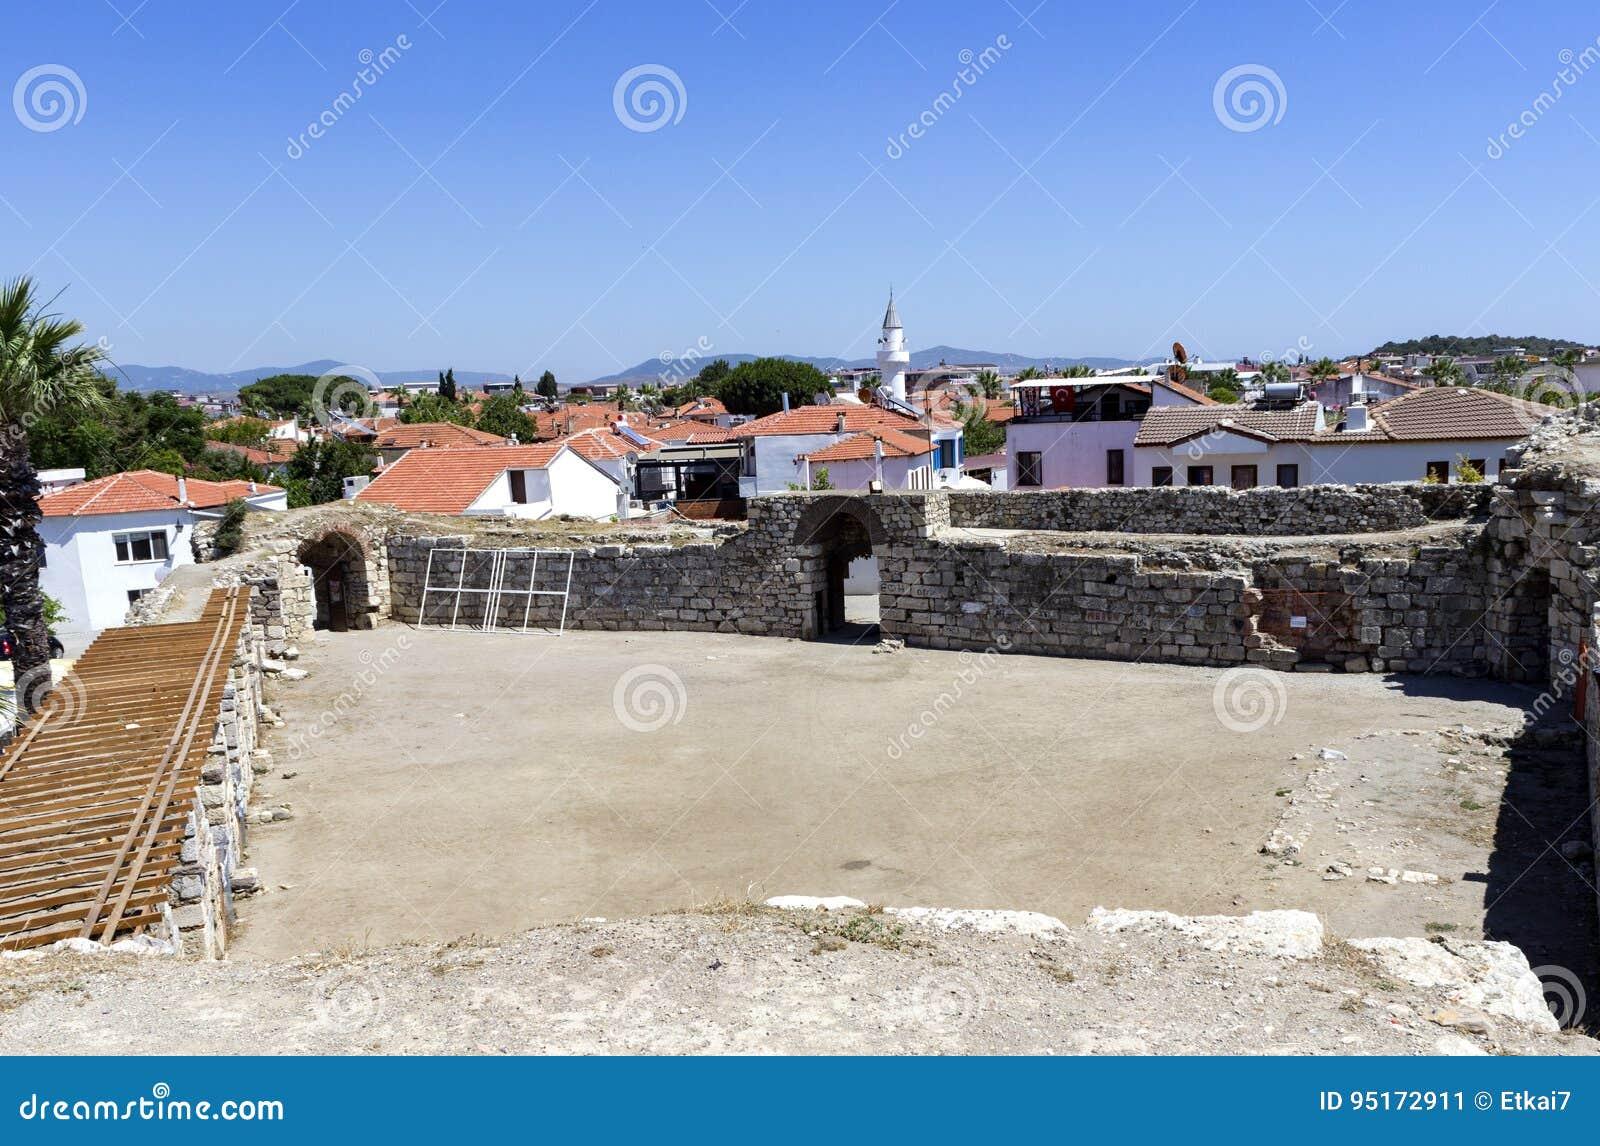 Sigacik Castle With City View Izmir Turkey Stock Image Image Of History Ruins 95172911